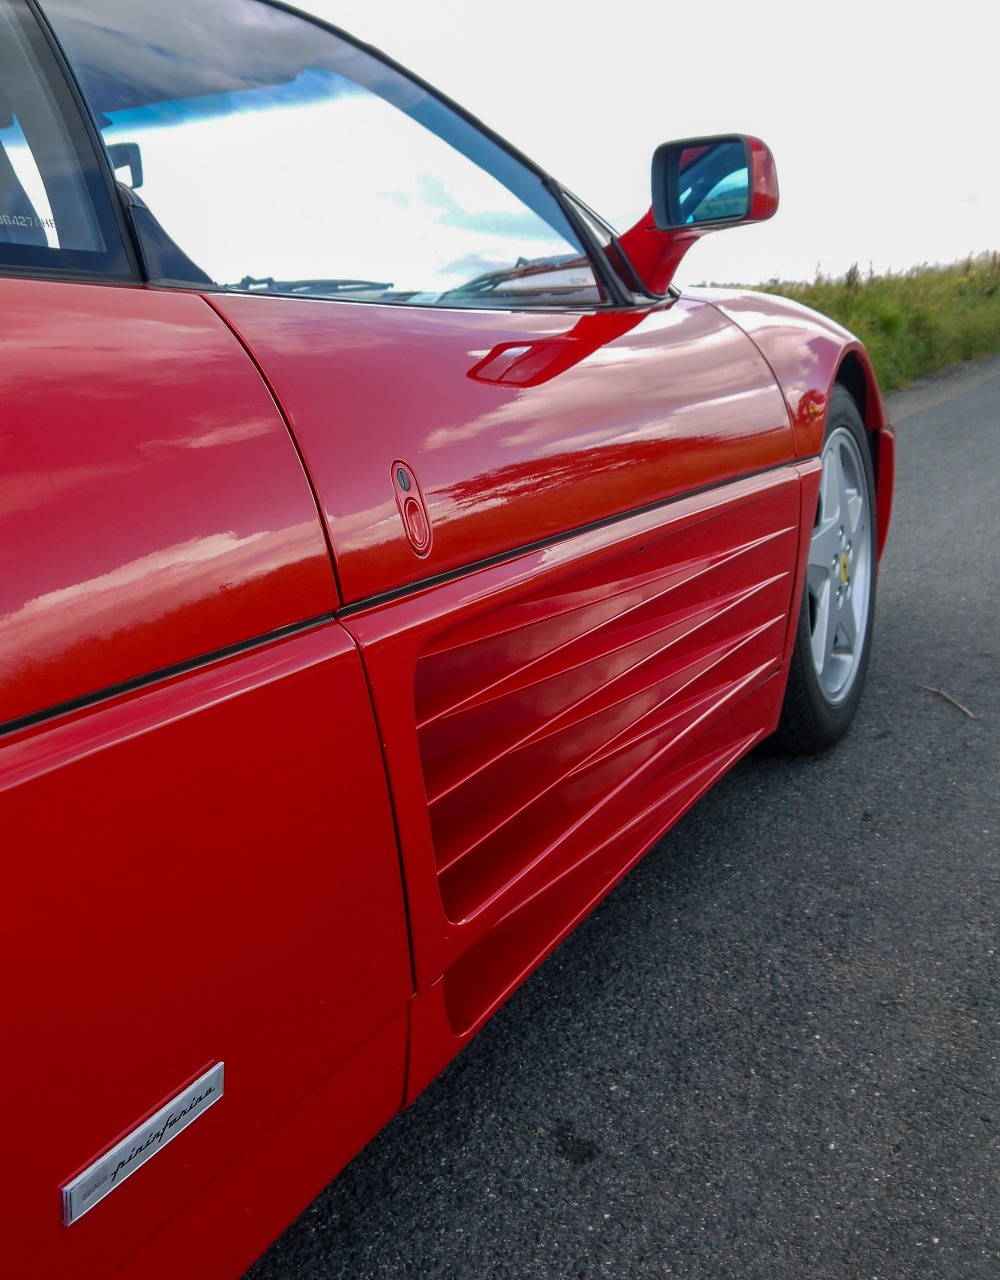 1993 FERRARI 348 TRASVERSALE BERLINETTA Registration Number: L796THC Chassis Number: - Image 13 of 49